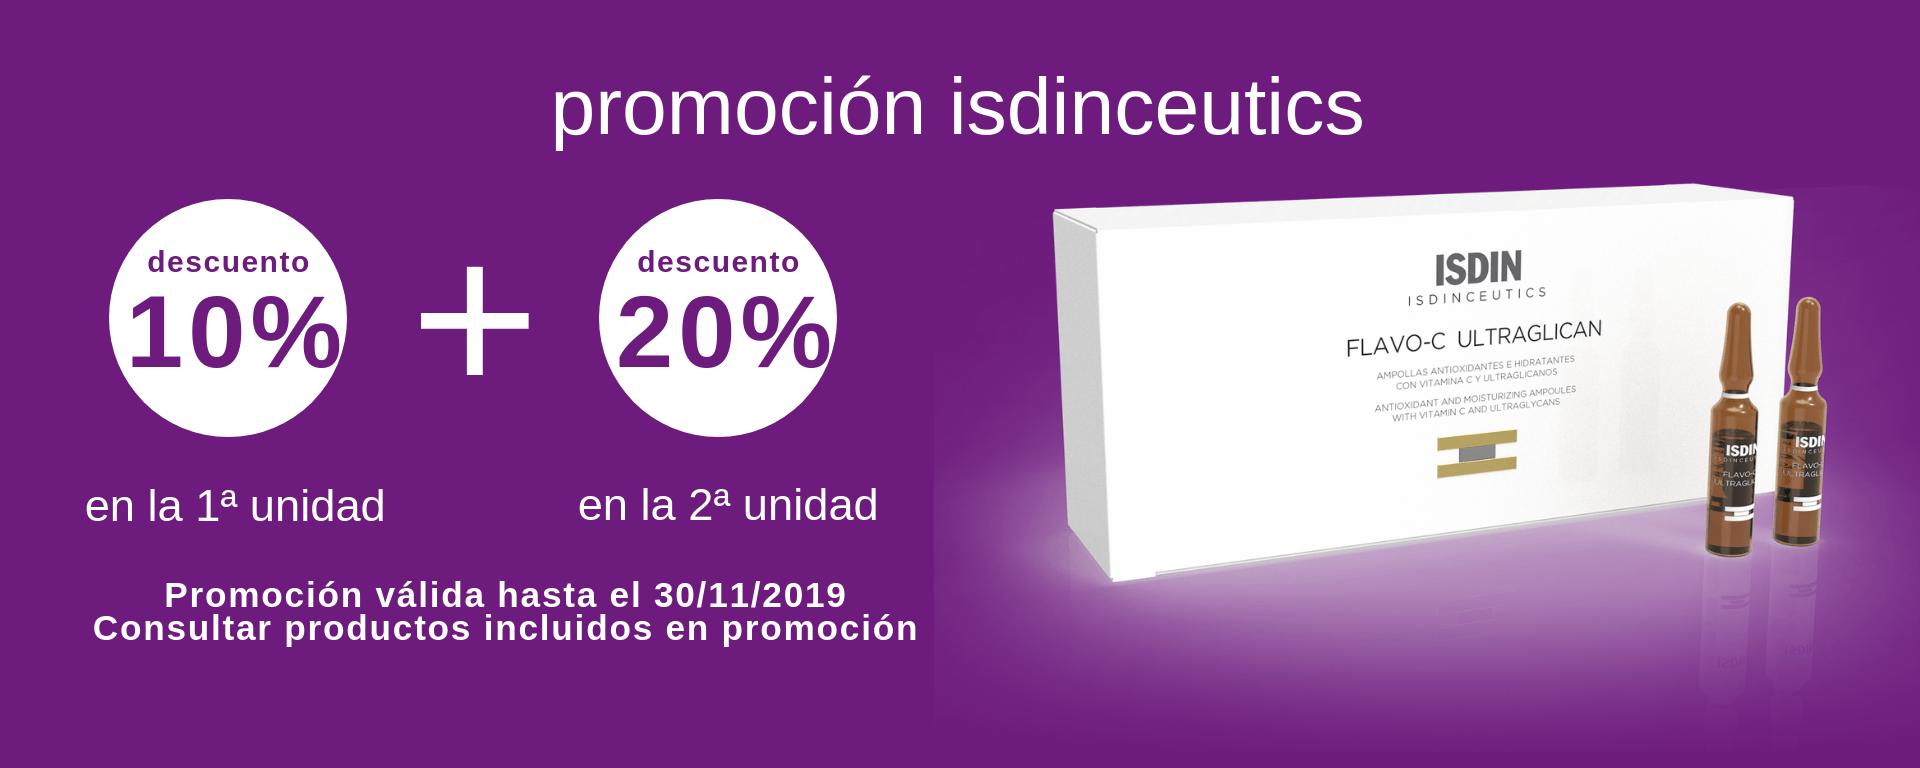 Promo Isdinceutics Farmacia Ciudad Alta